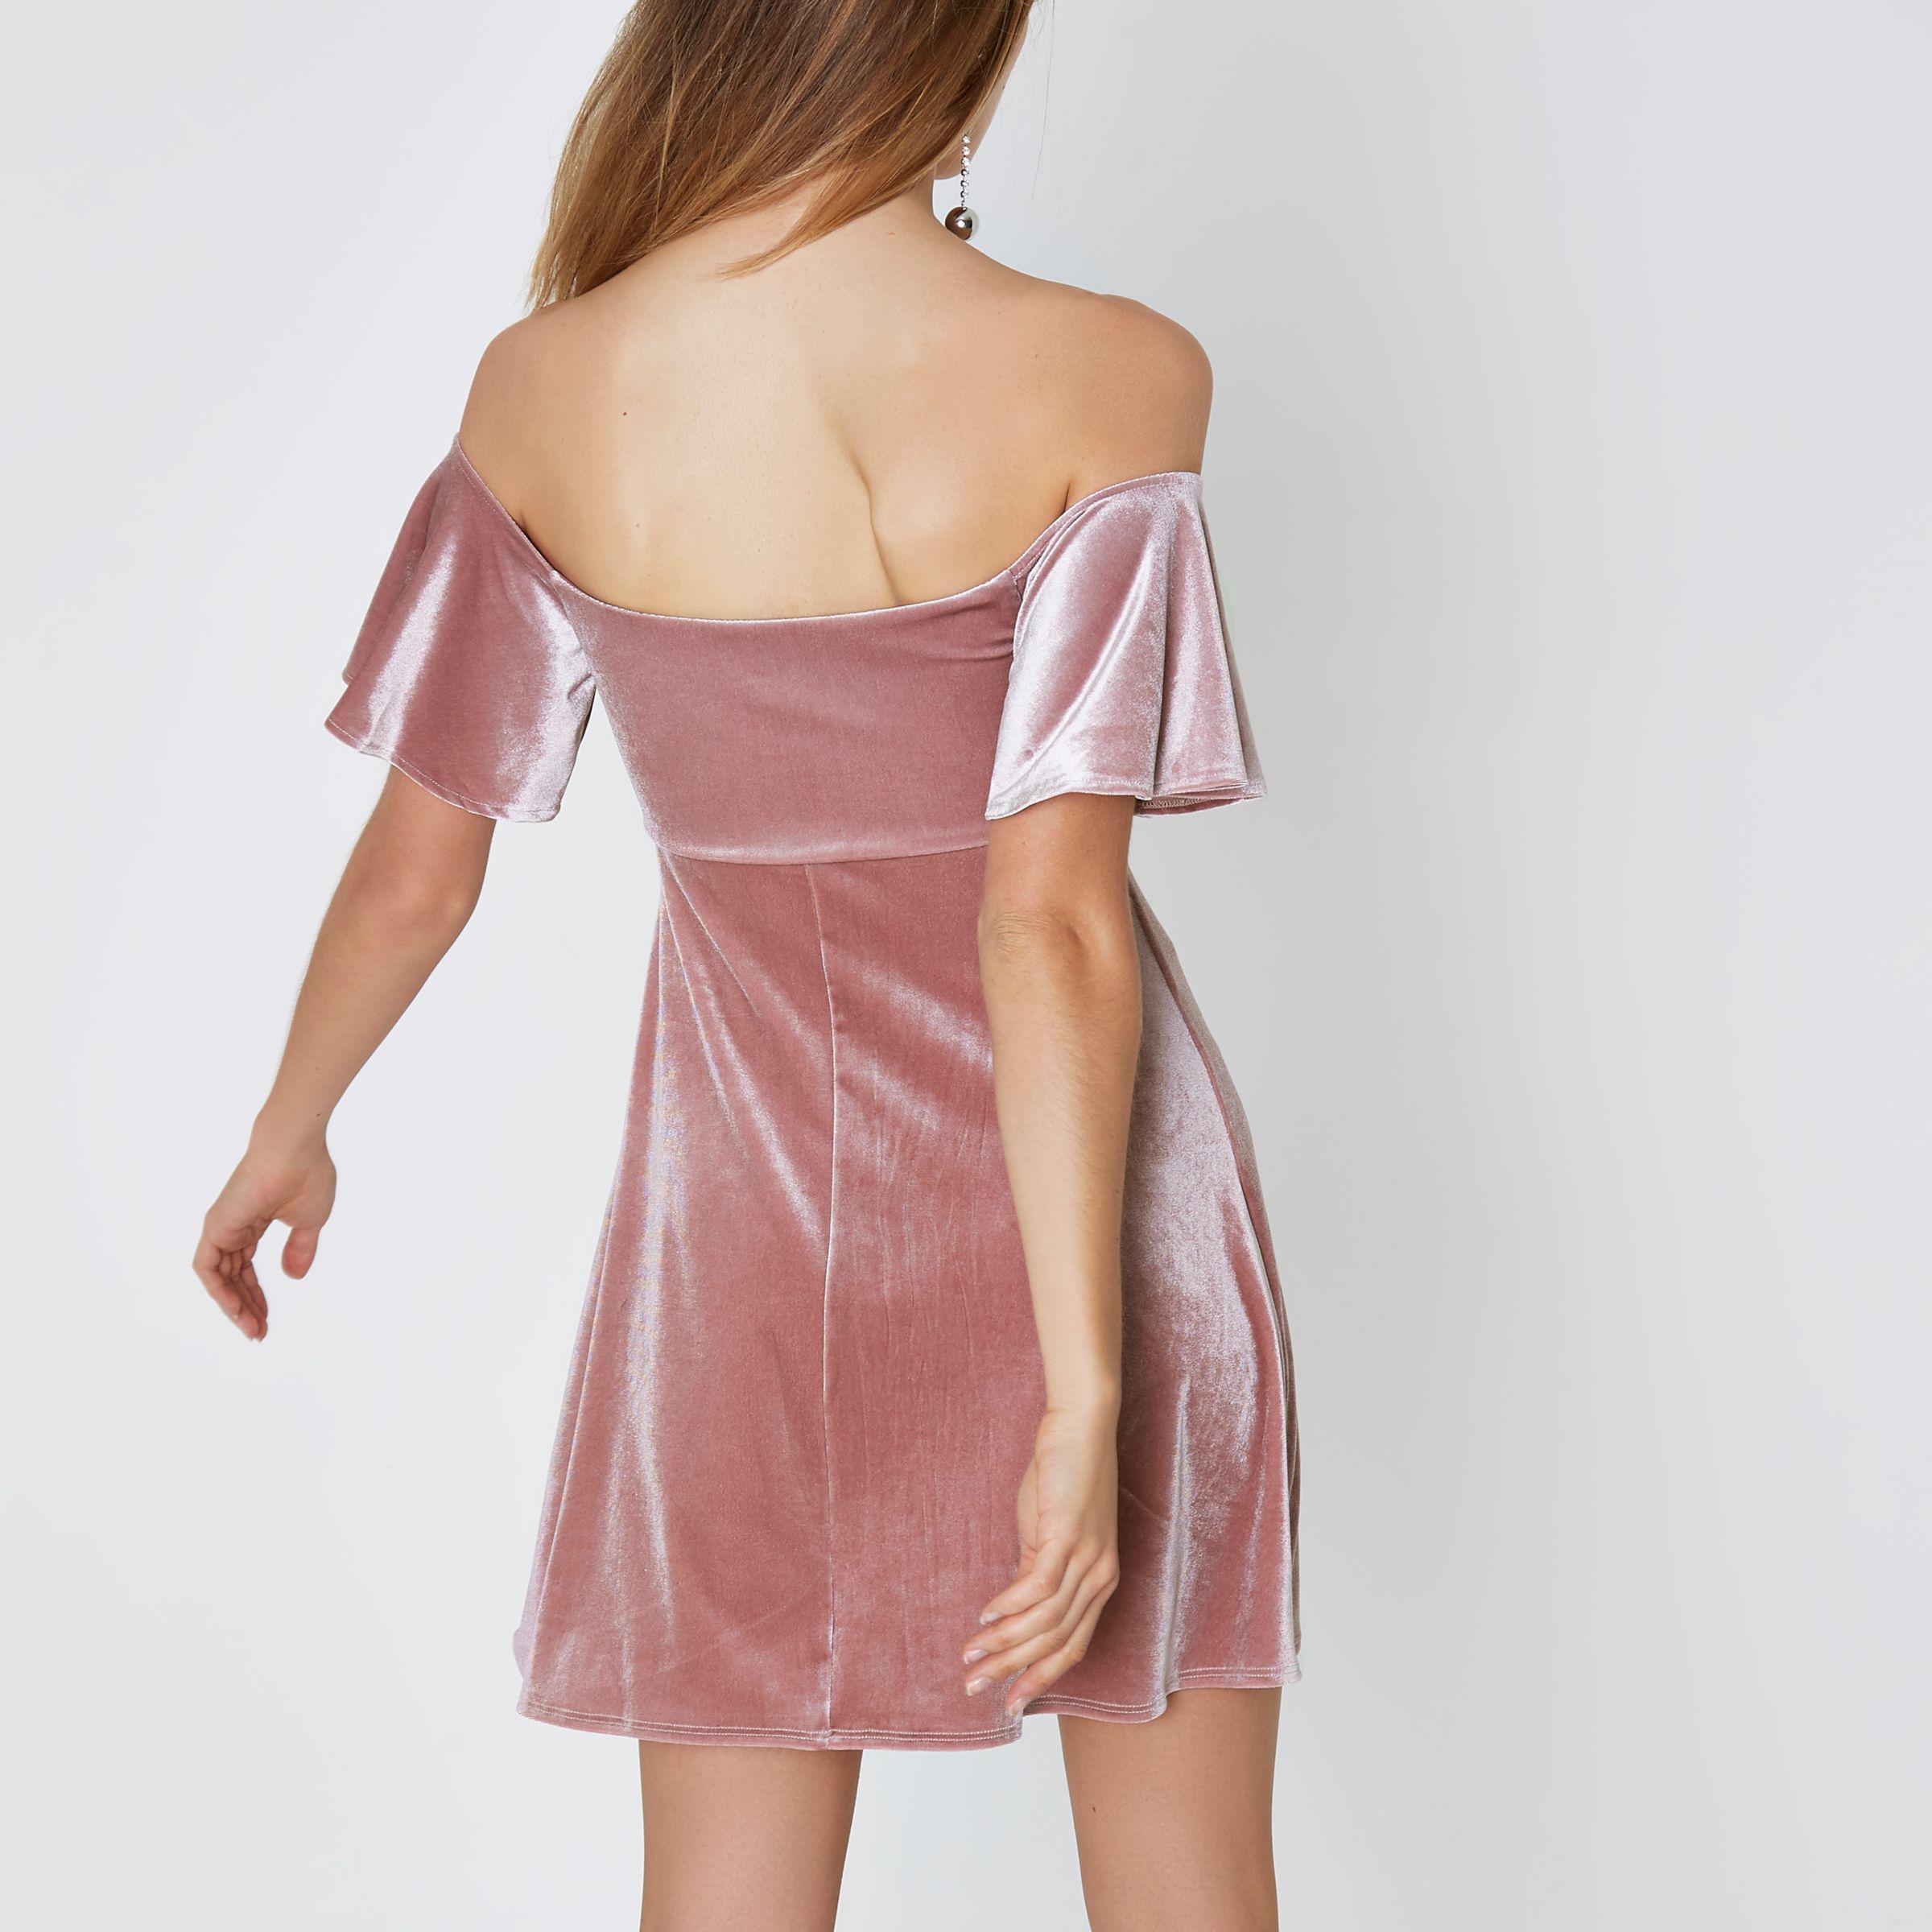 2f6c98caba4e5 River Island Pink Velvet Ruched Bardot Mini Skater Dress in Pink - Lyst